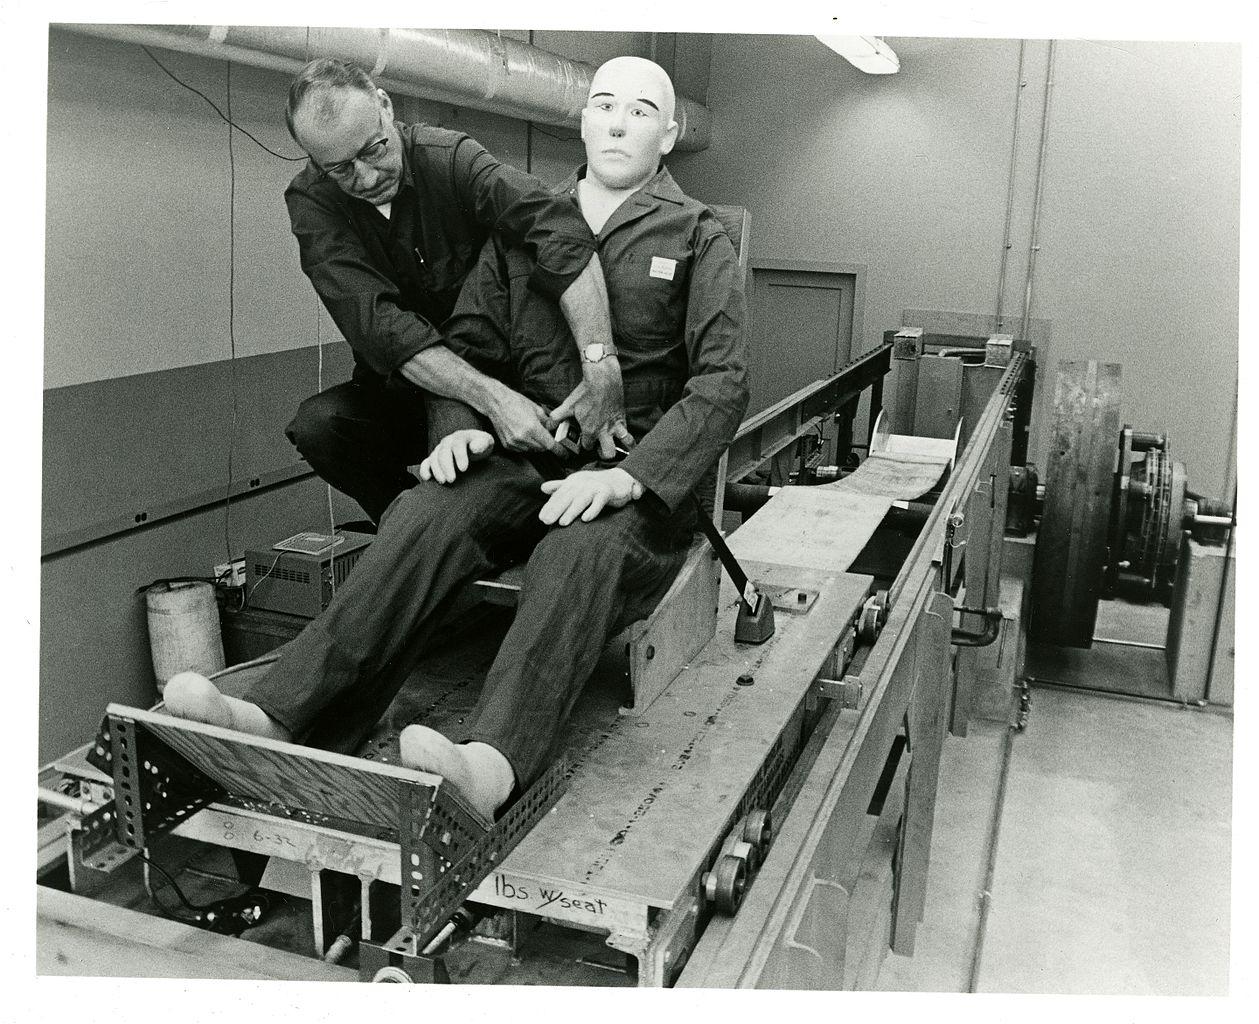 Automotive seatbelt testing